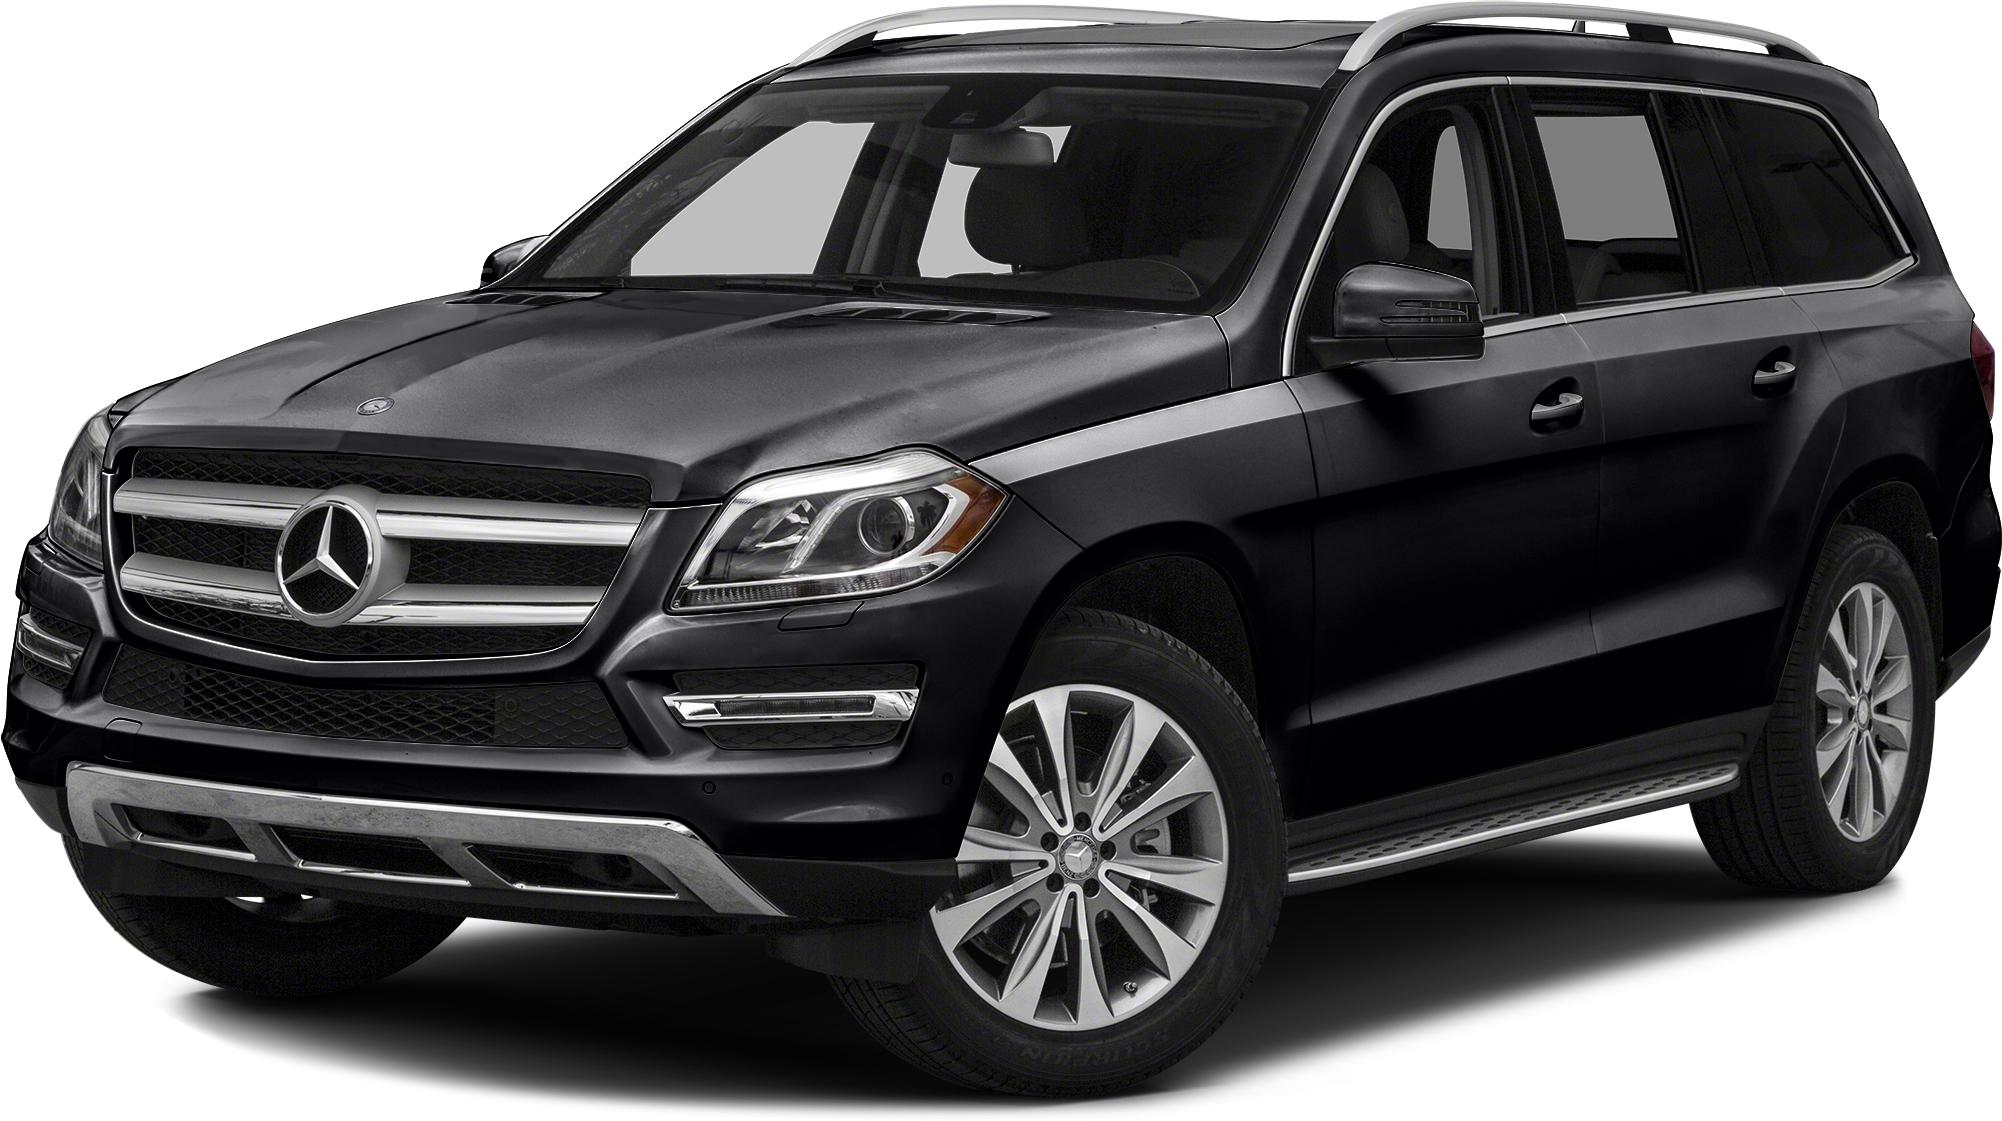 audi certified pre owned vehicle program edmunds autos post. Black Bedroom Furniture Sets. Home Design Ideas